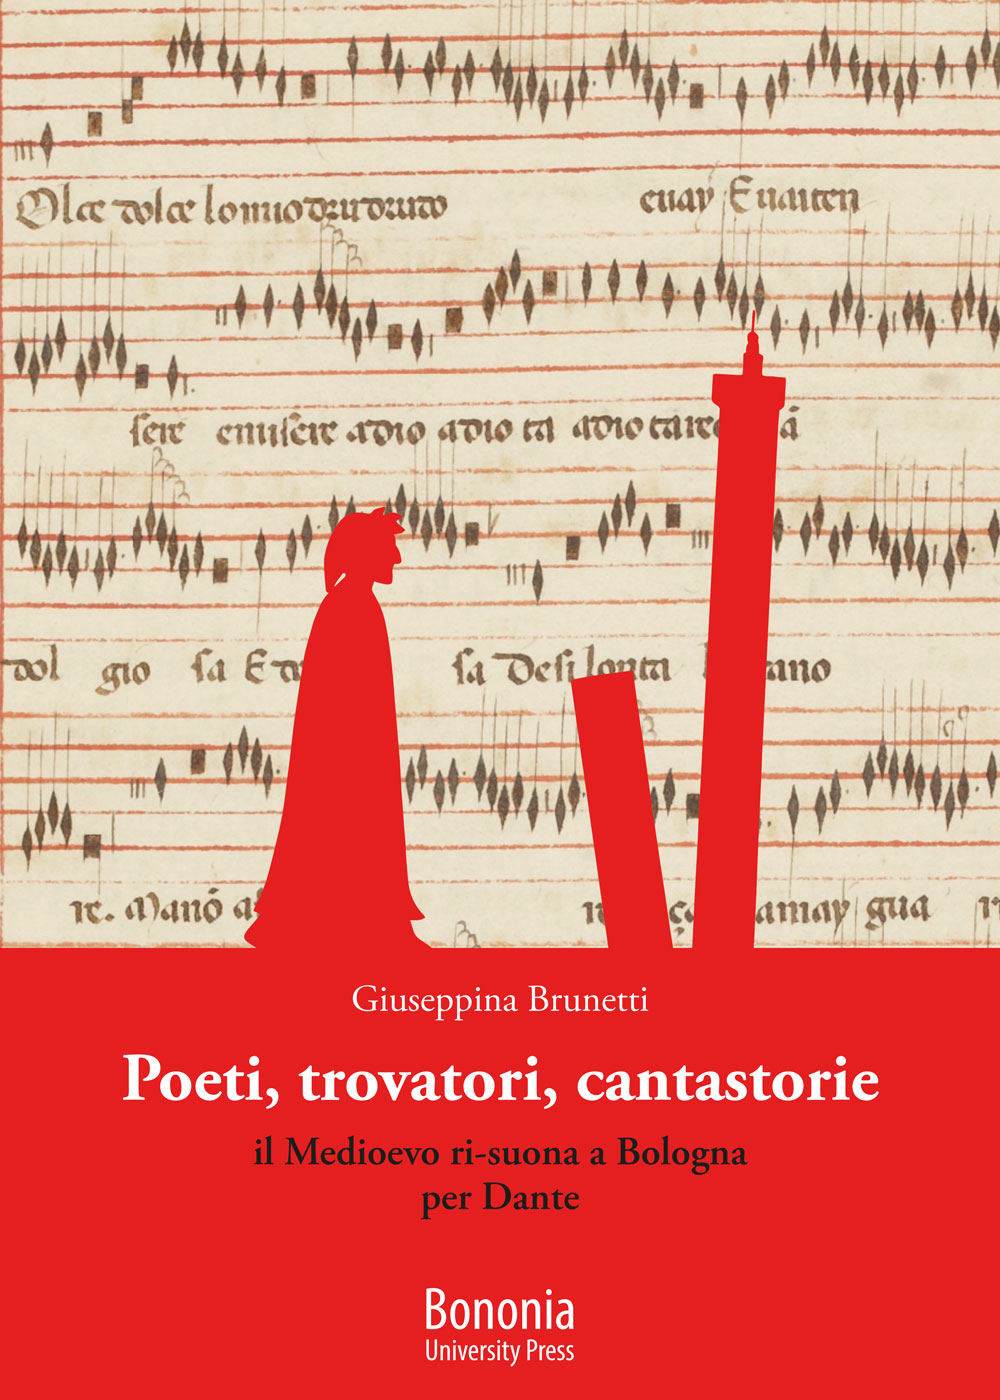 Poeti, trovatori, cantastorie - Bononia University Press